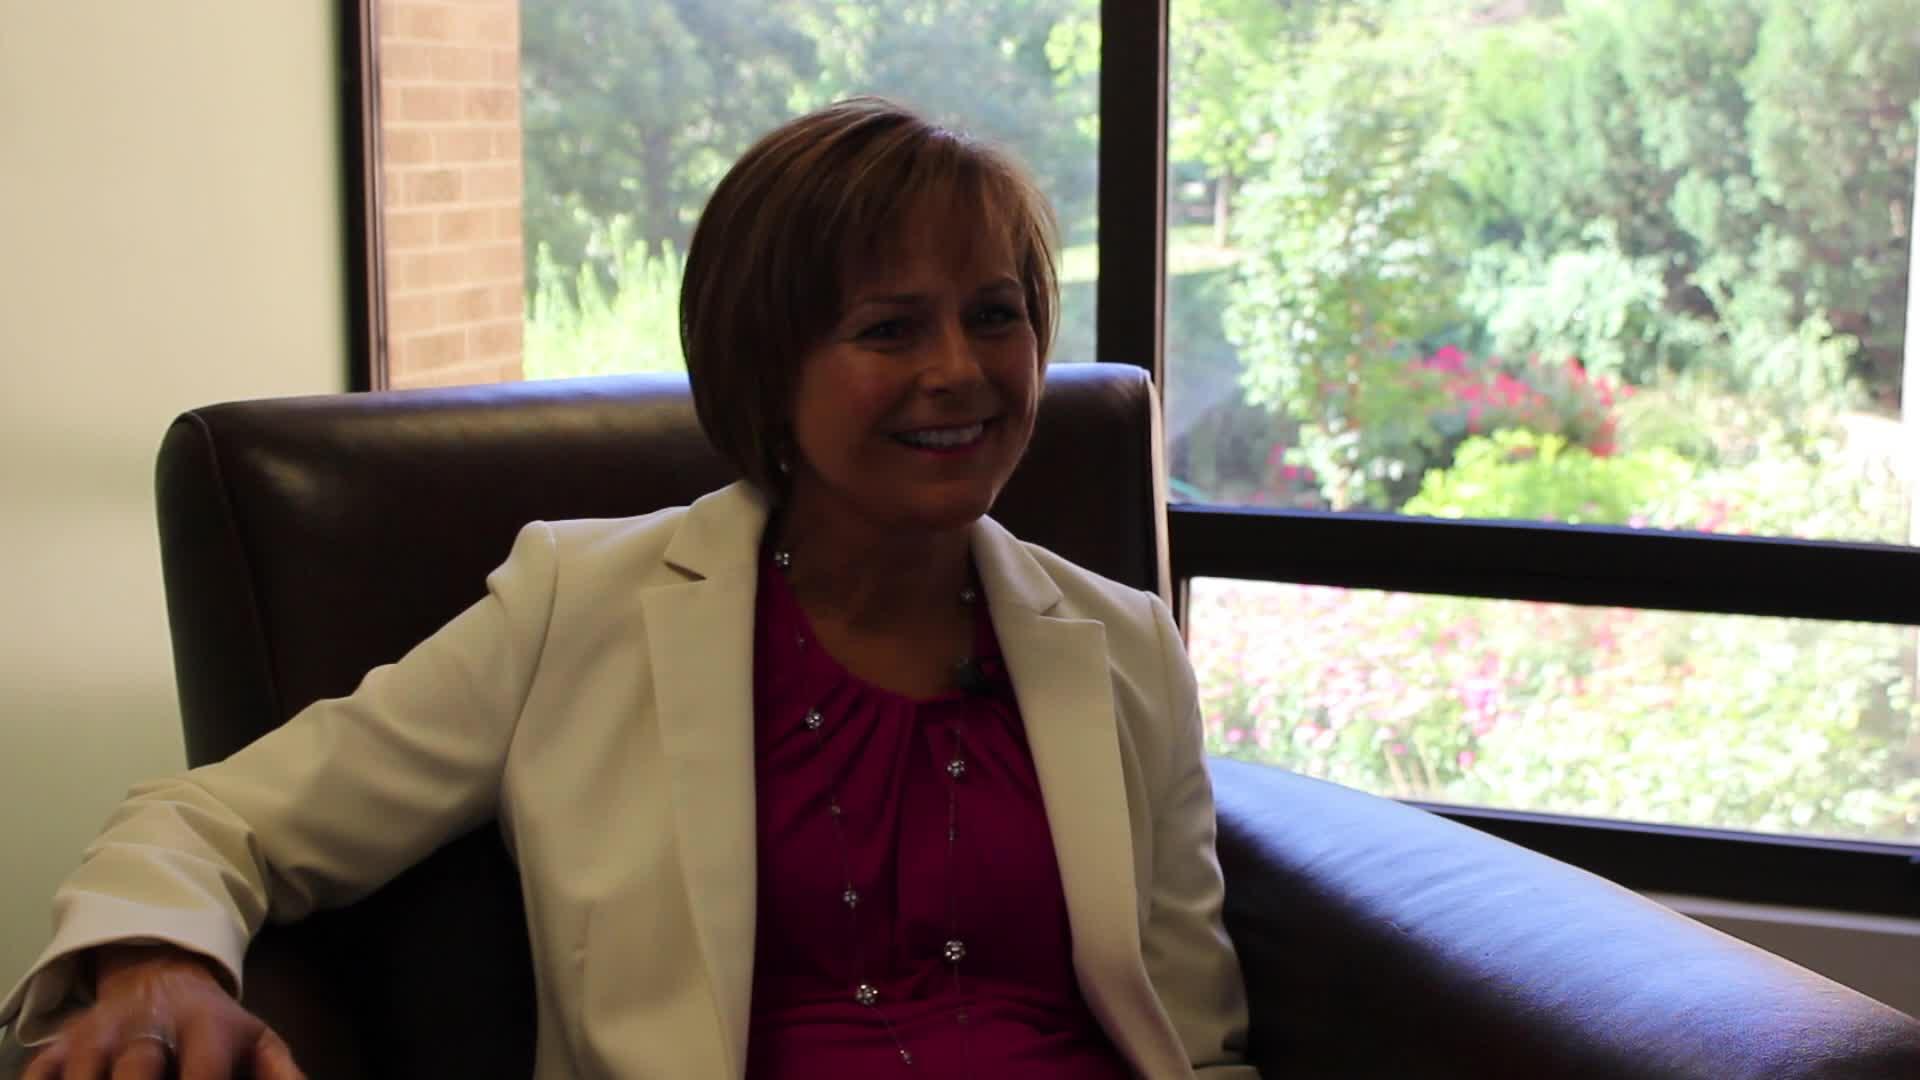 Deanne Splattstoesser farewell